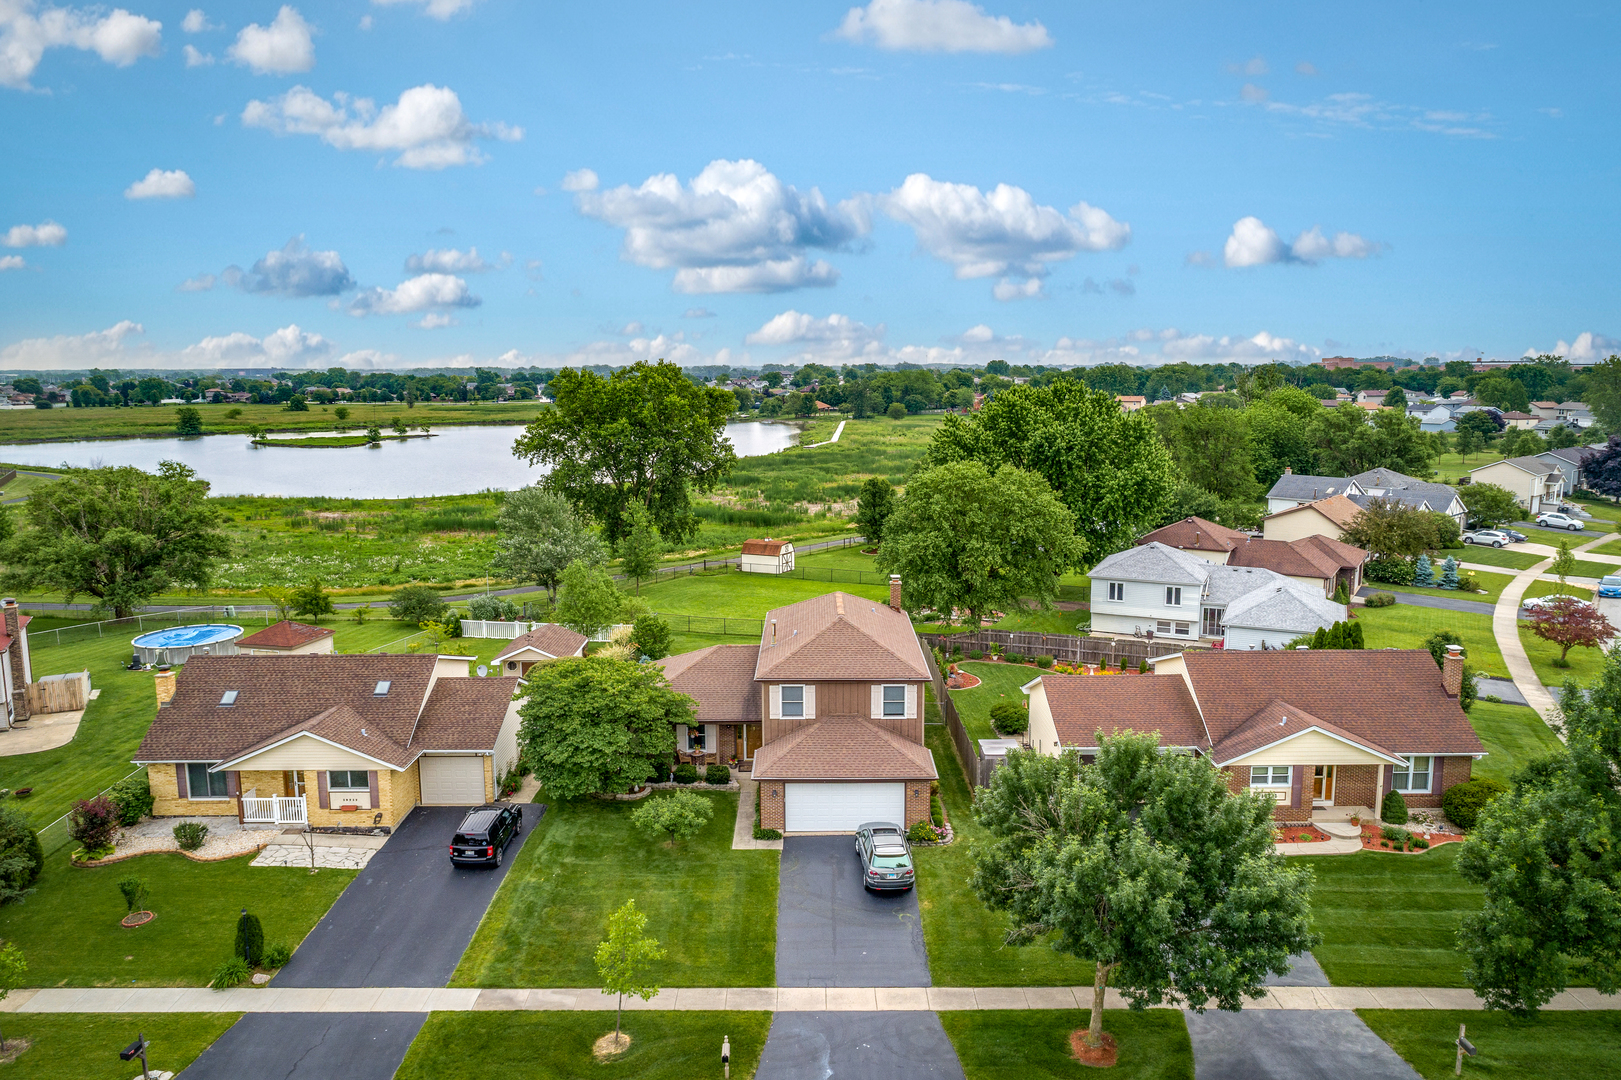 19723 South Skidmore, FRANKFORT, Illinois, 60423